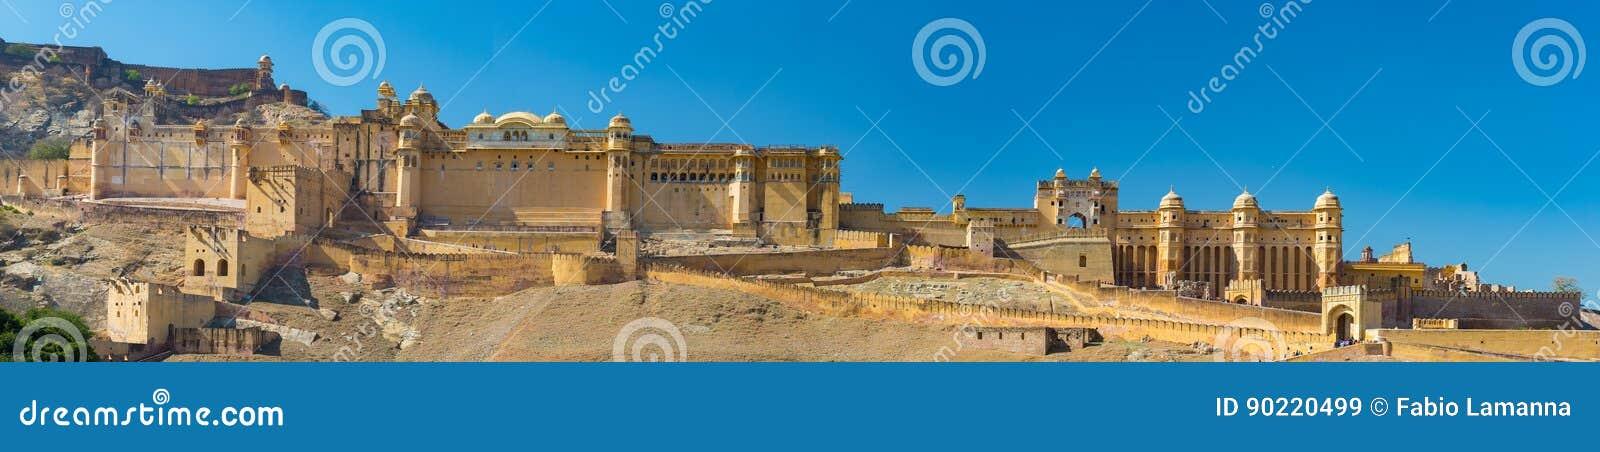 Het indrukwekkende landschap en cityscape in Amber Fort, beroemde reisbestemming in Jaipur, Rajasthan, India Hoge resolutiepano